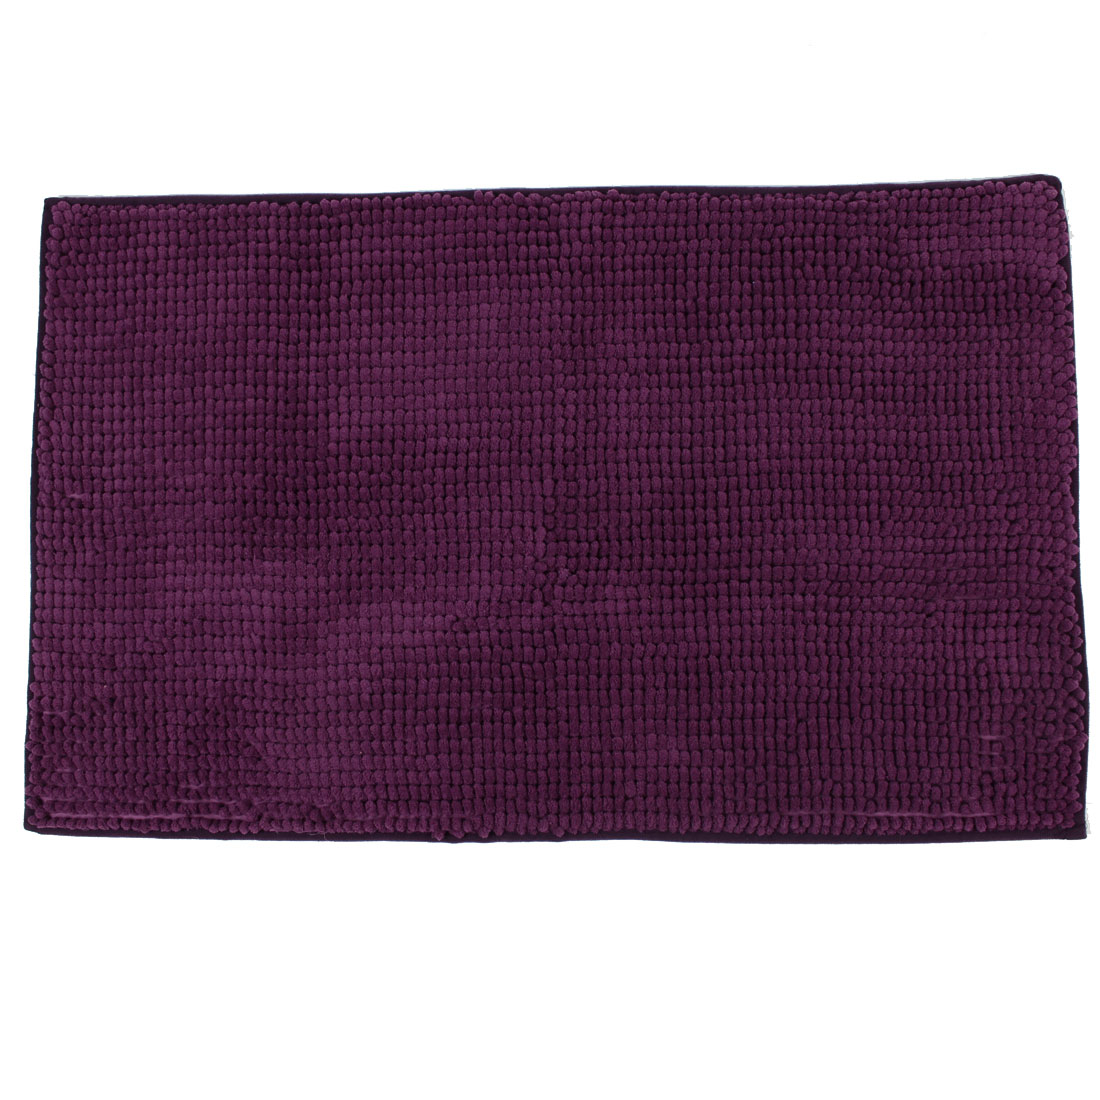 Hotel Bathroom Household Soft Non Slip Absorbent Shower Bath Mat Rugs Purple 20 x 32 Inch